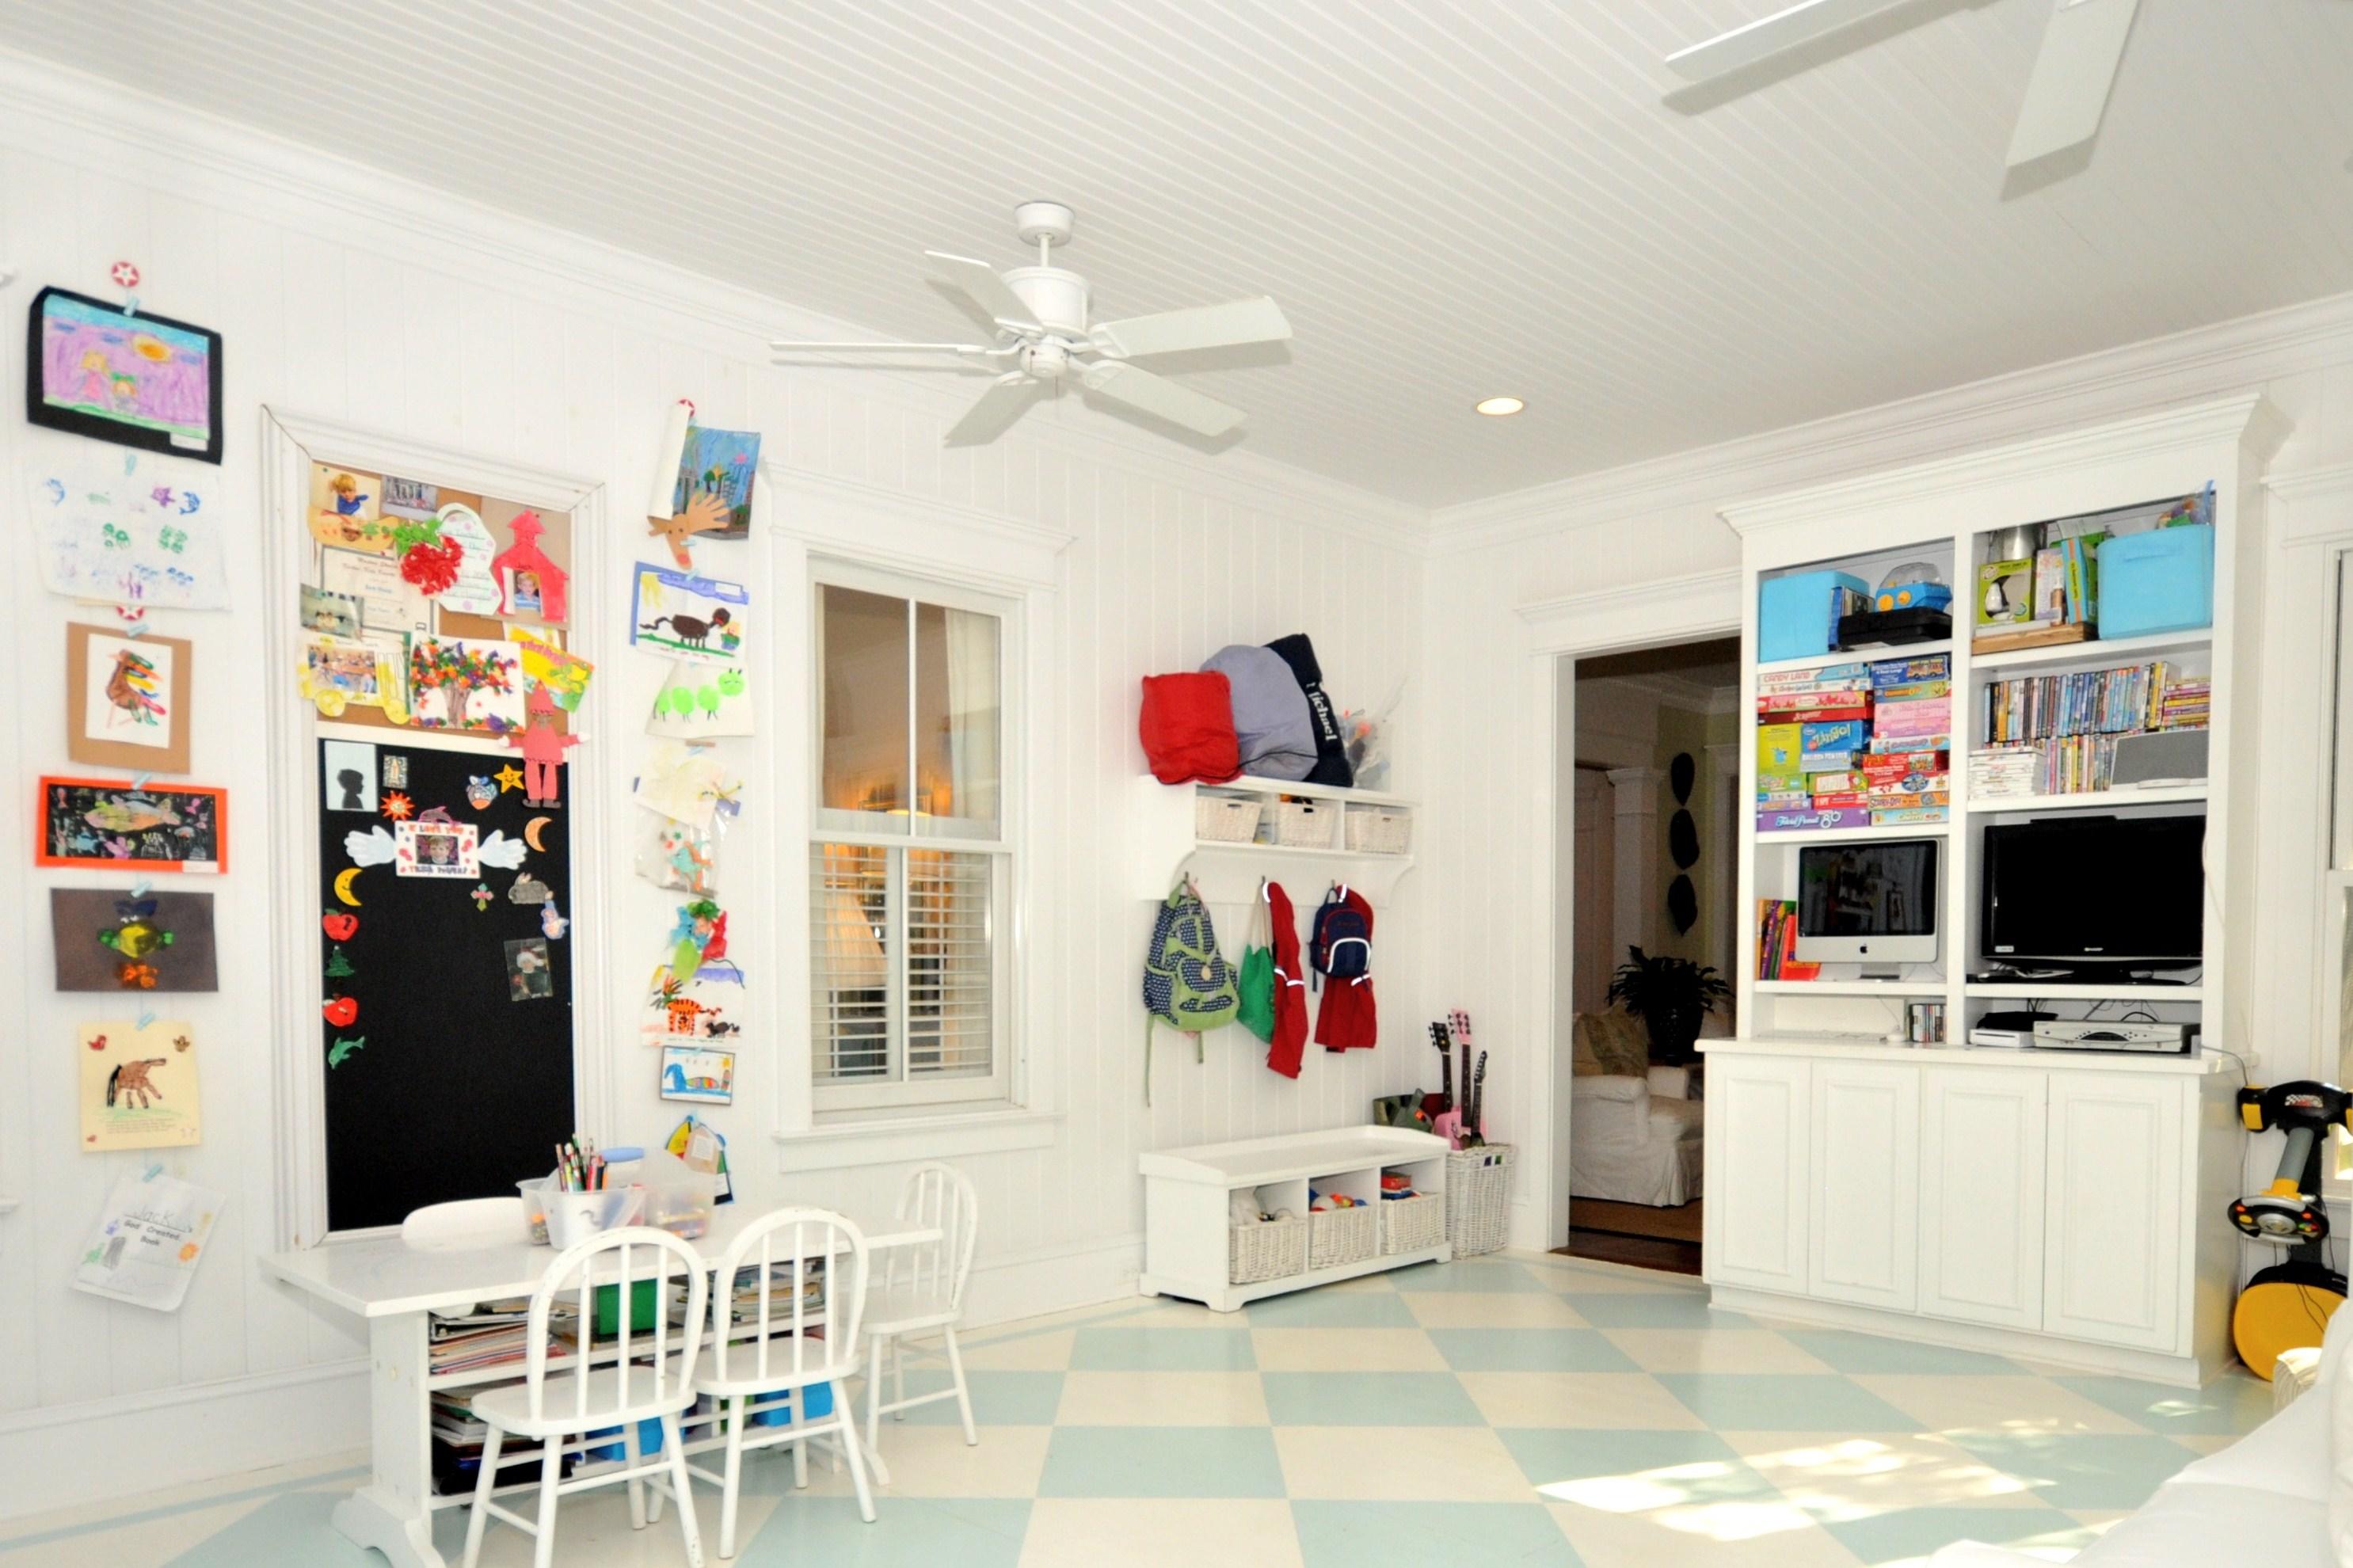 decorating a playroom | the charleston porch